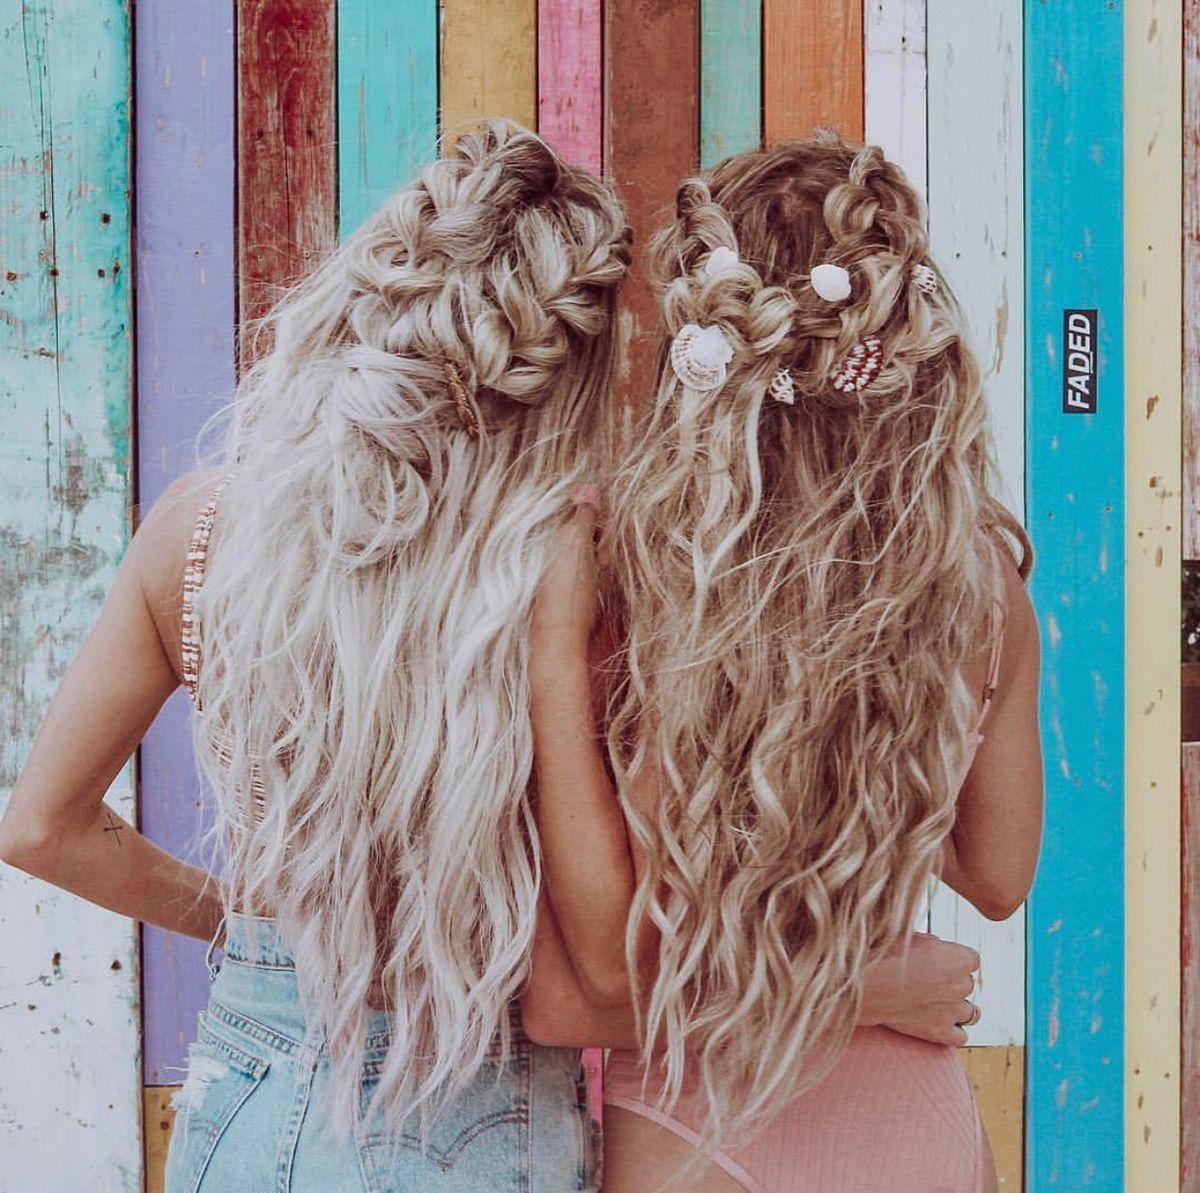 #hairtutorials #hairvideo #videotutorial #updotutorials #longhair #longhairstyle